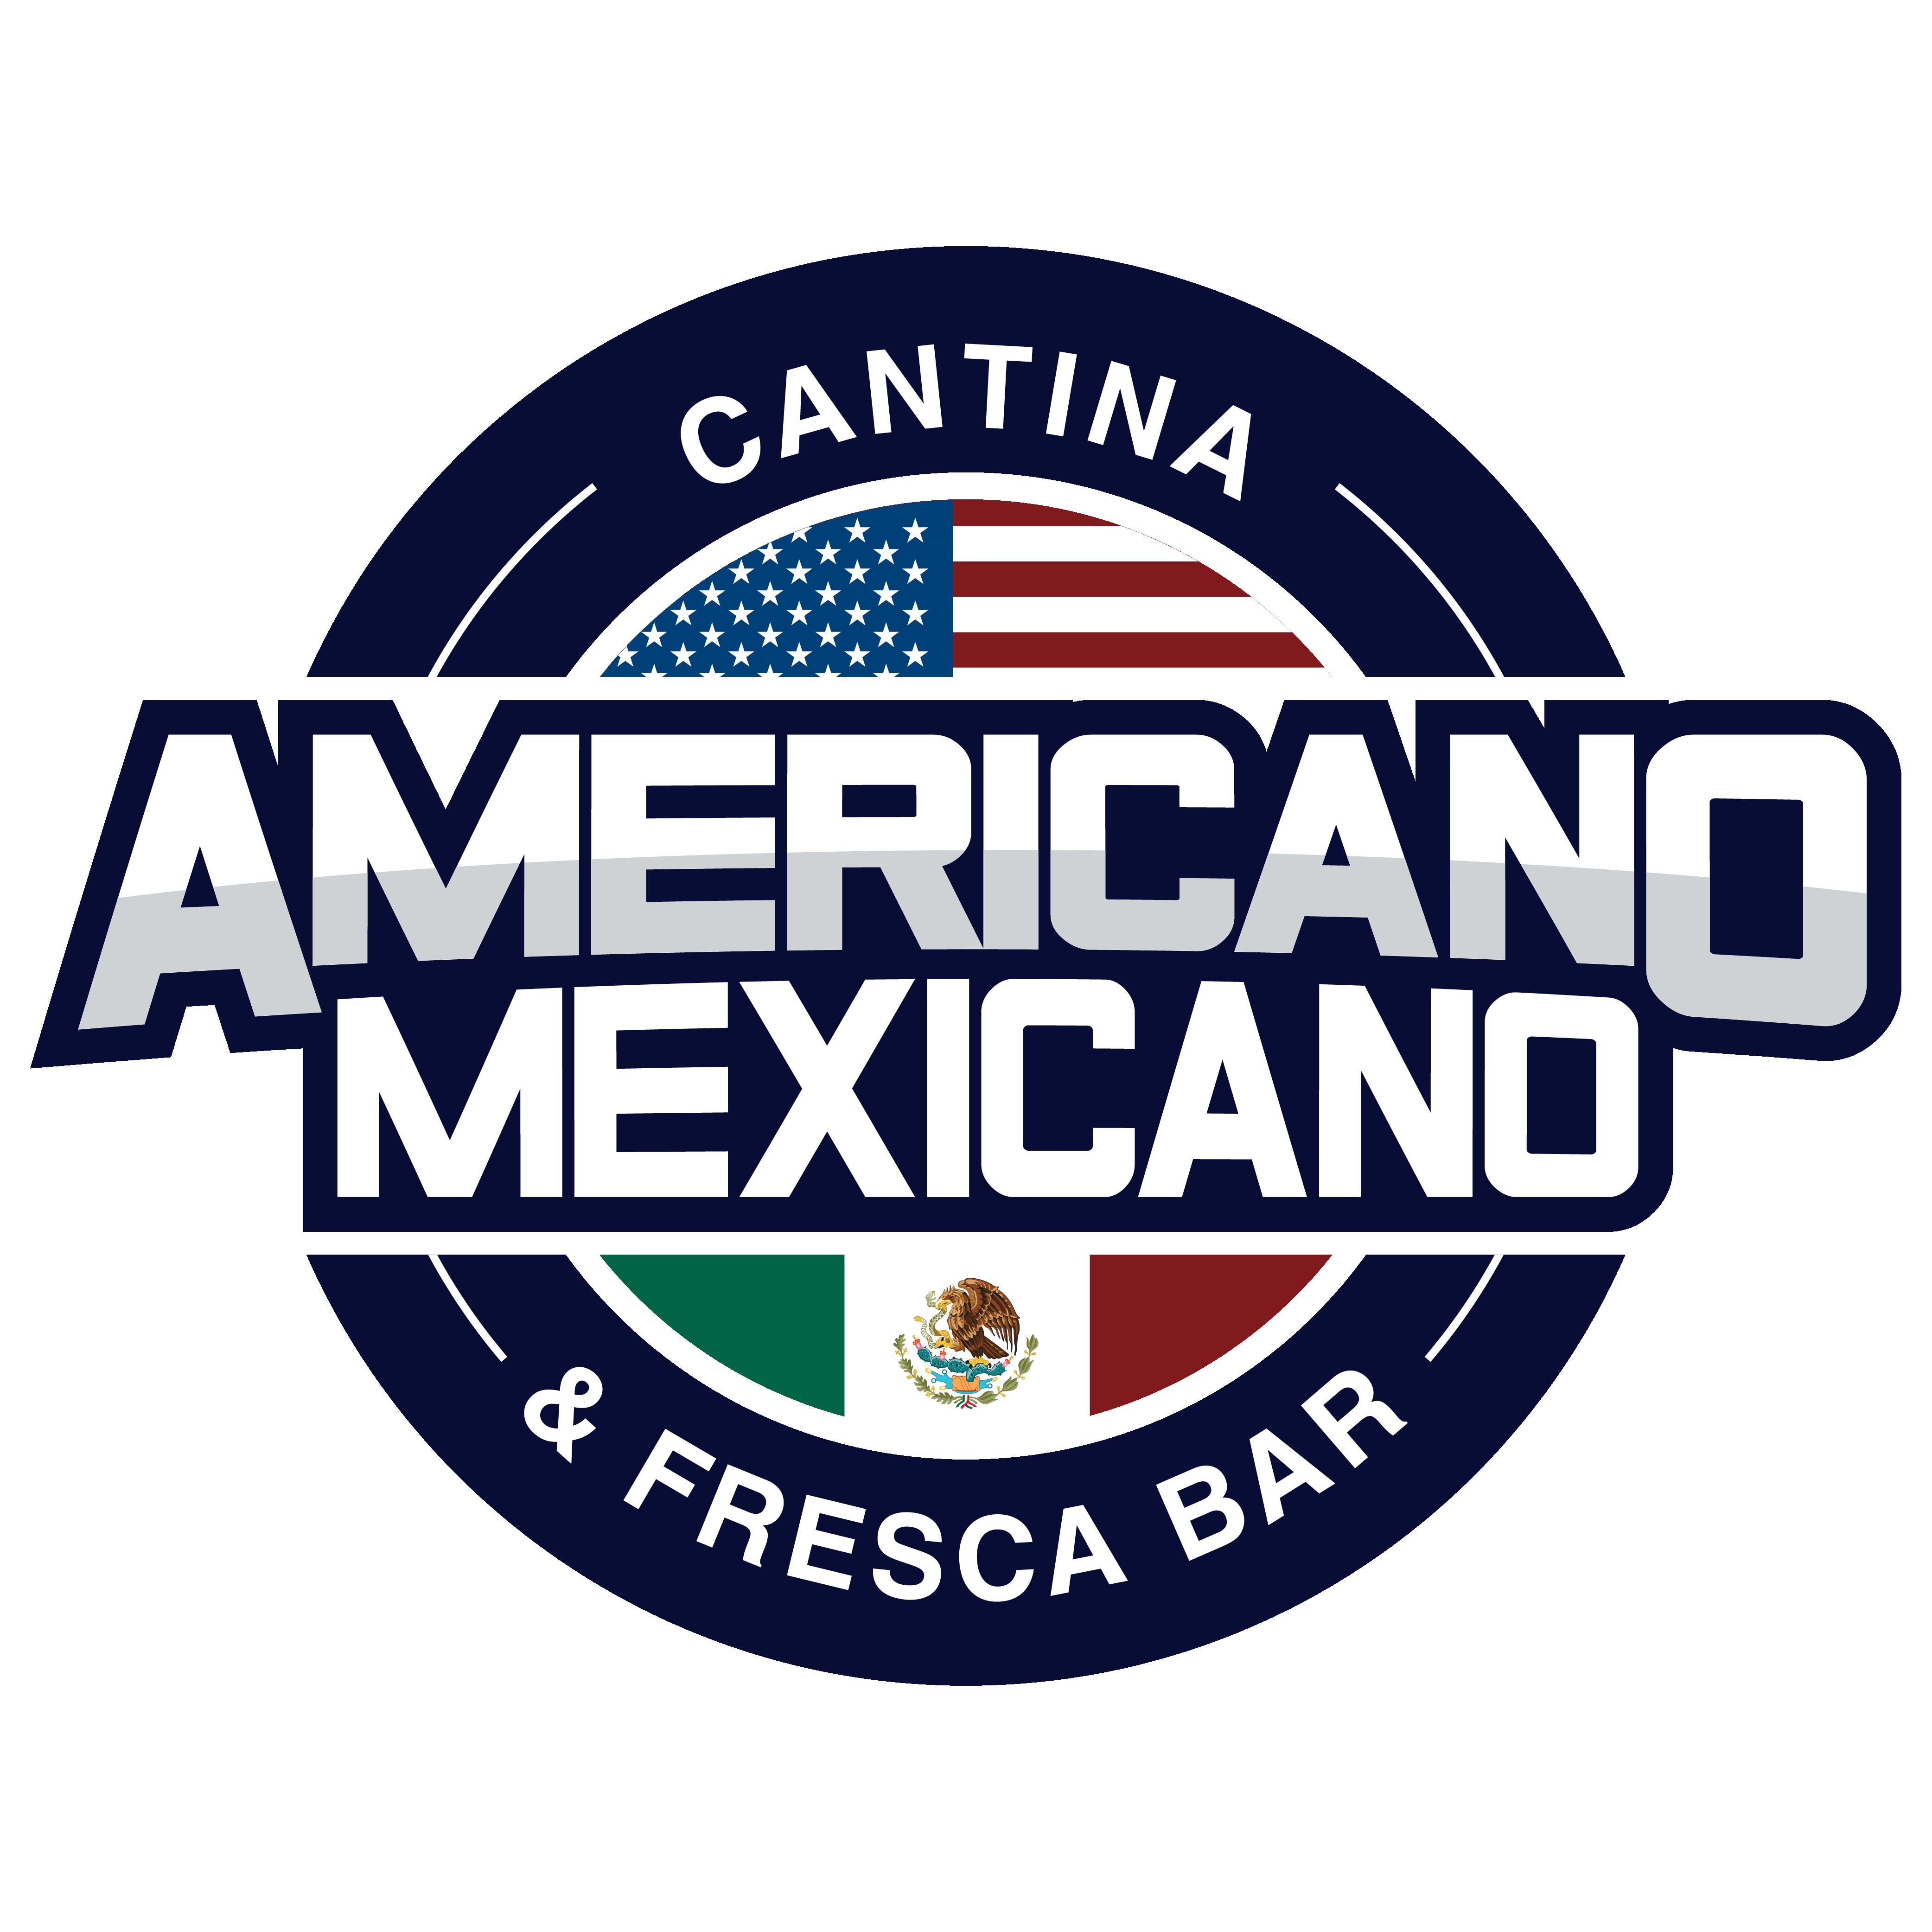 Americano Mexicano Cantina and Fresca bar seeking a new design